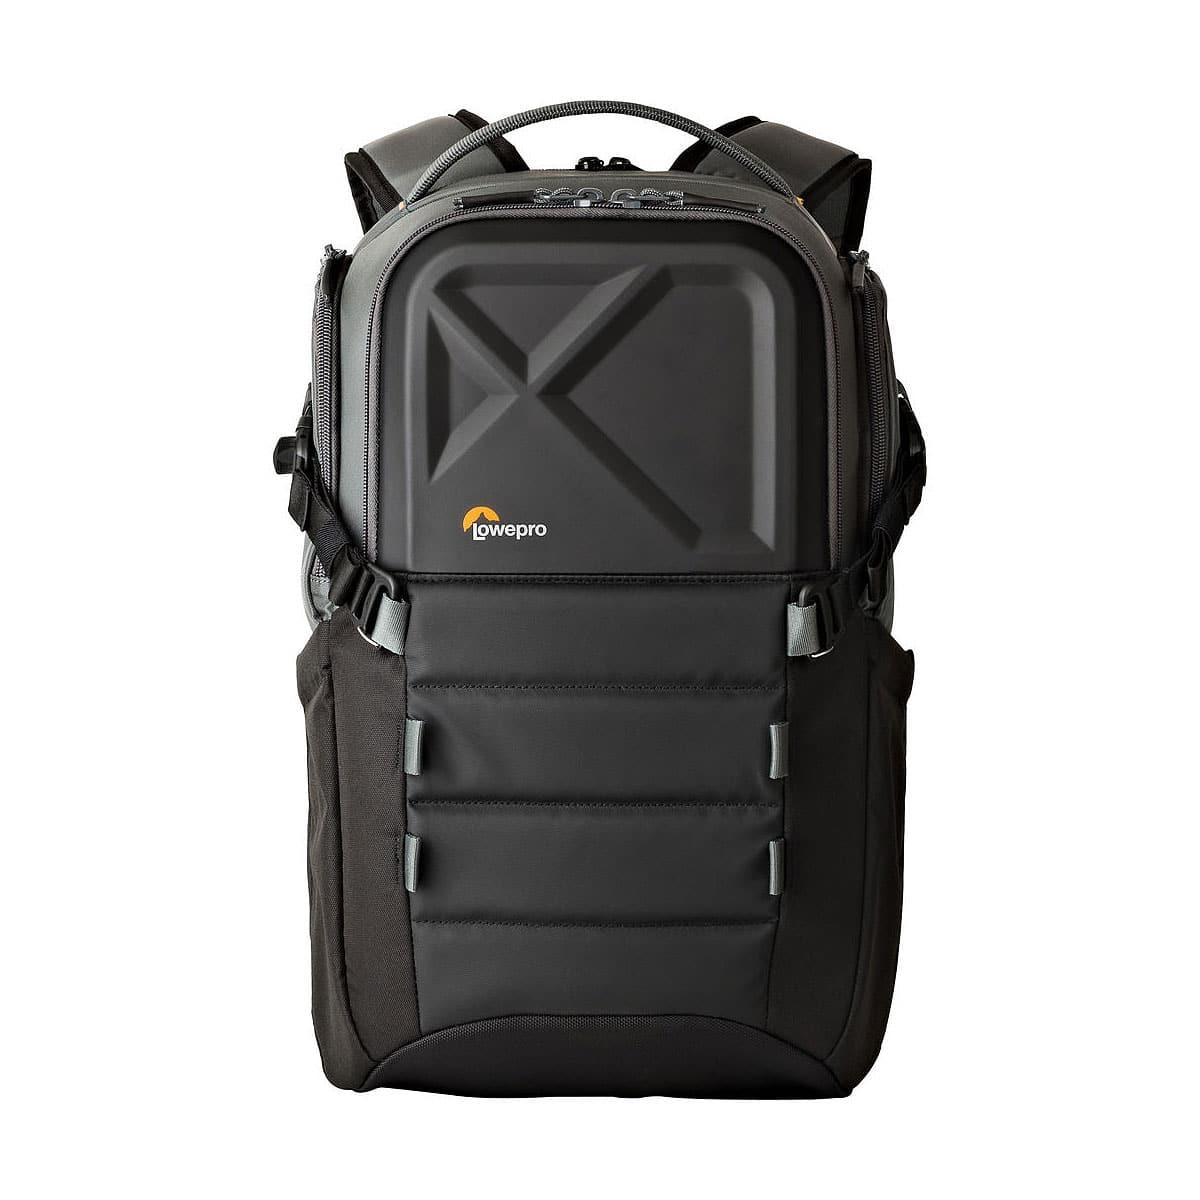 Lowepro QuadGuard BP X1